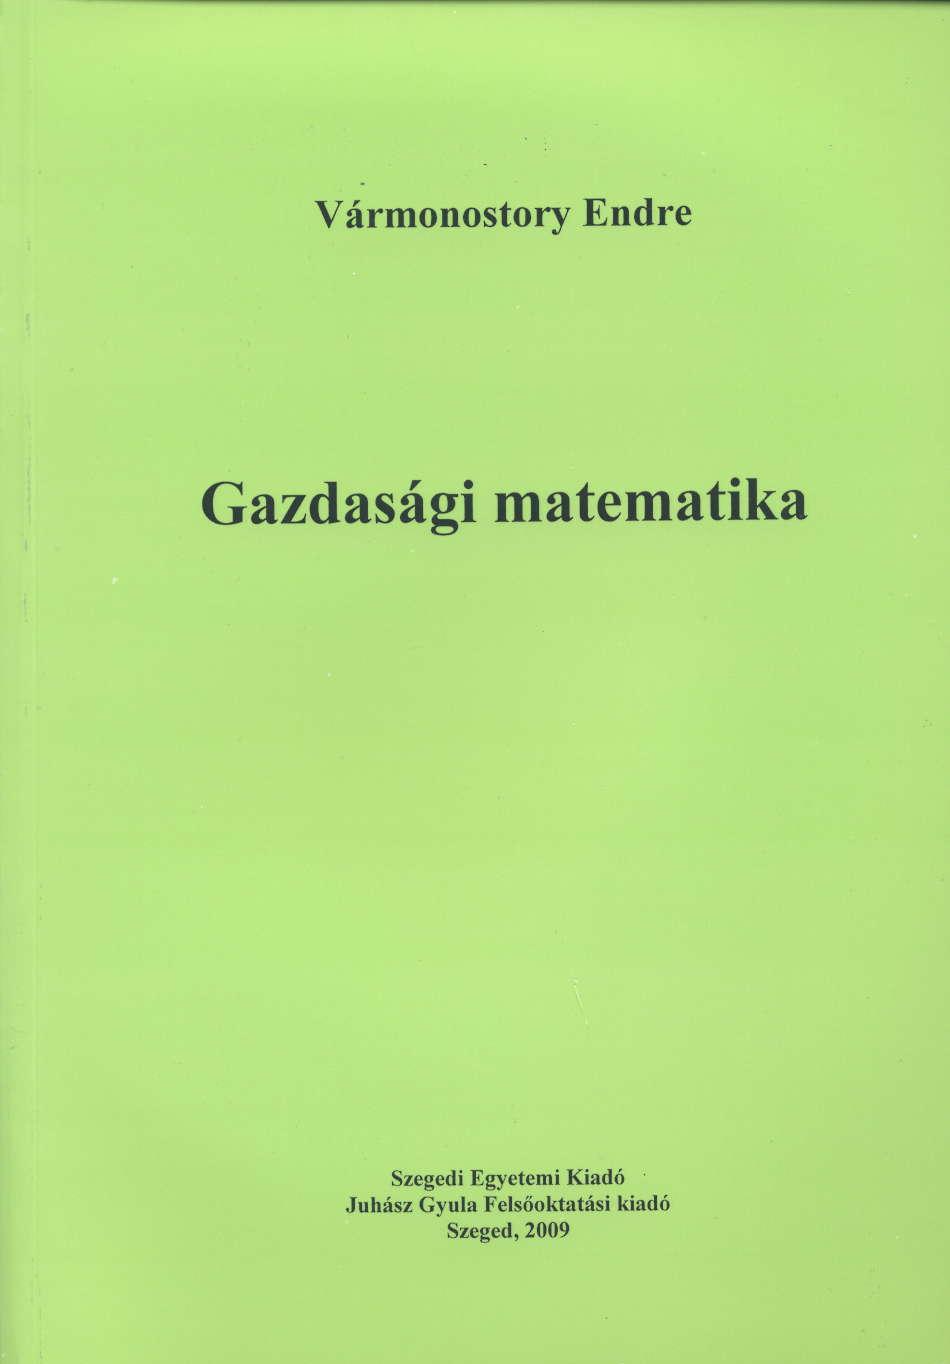 Gazdasági matematika - JGYFK